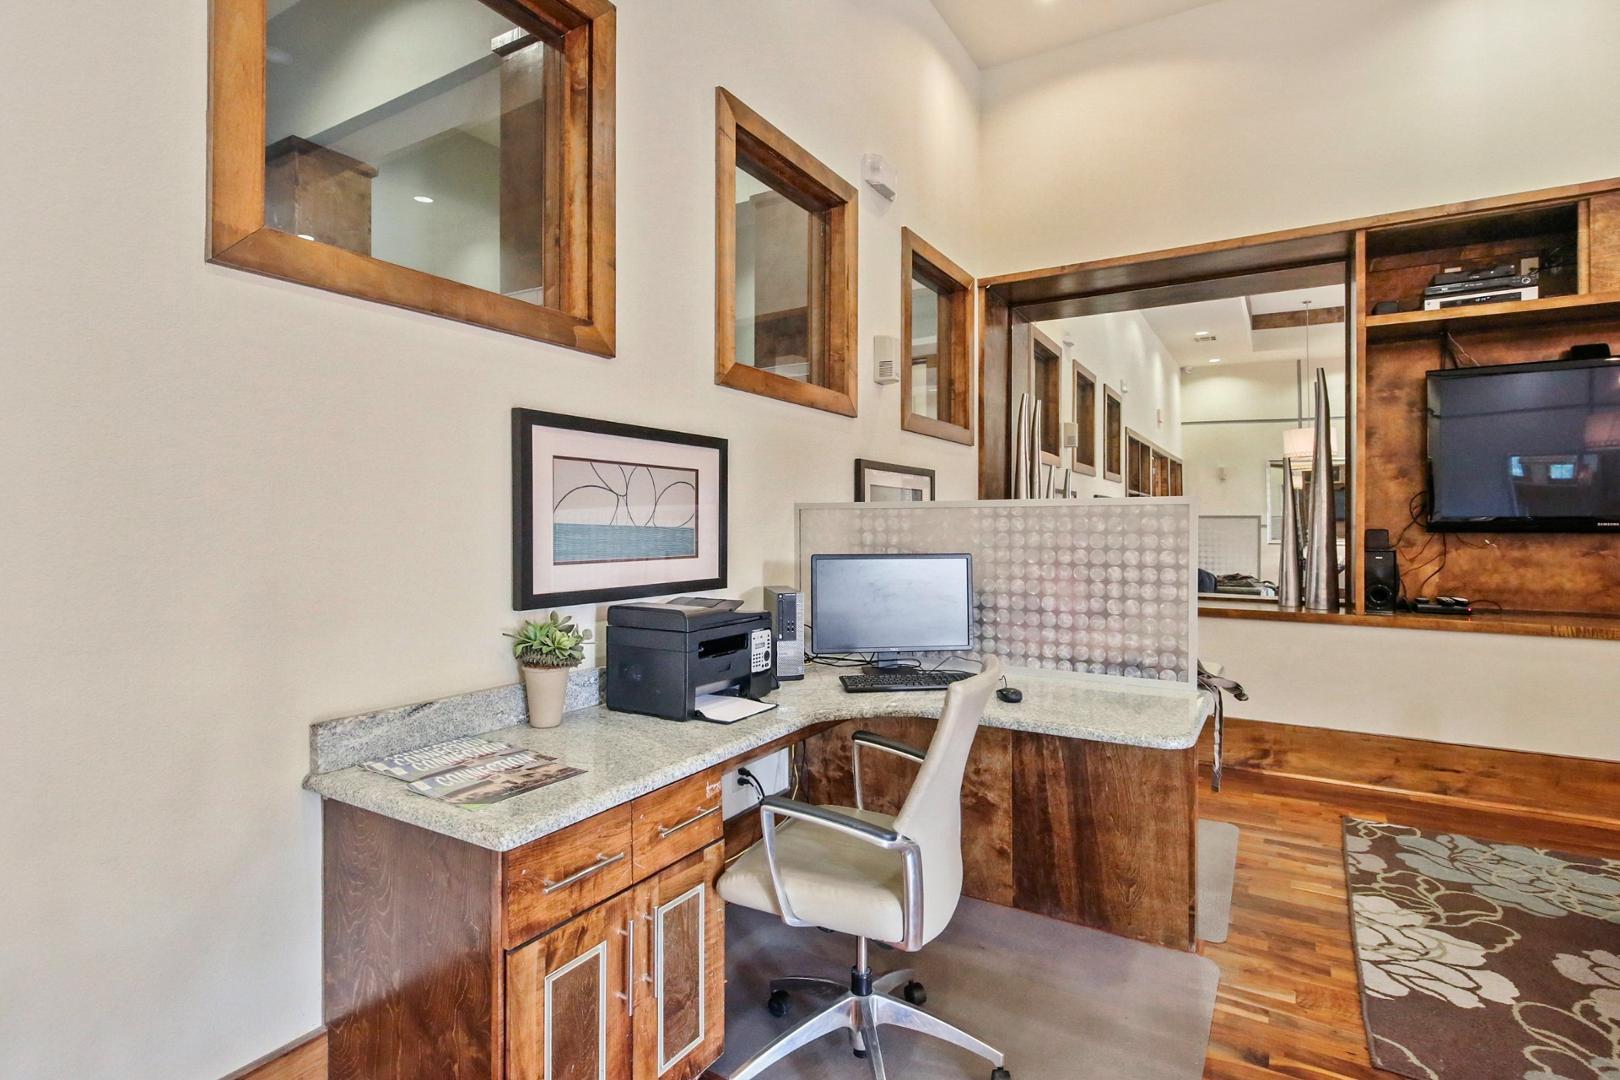 600 Woodbridge Parkway #2125, Wylie, TX - 1,400 USD/ month